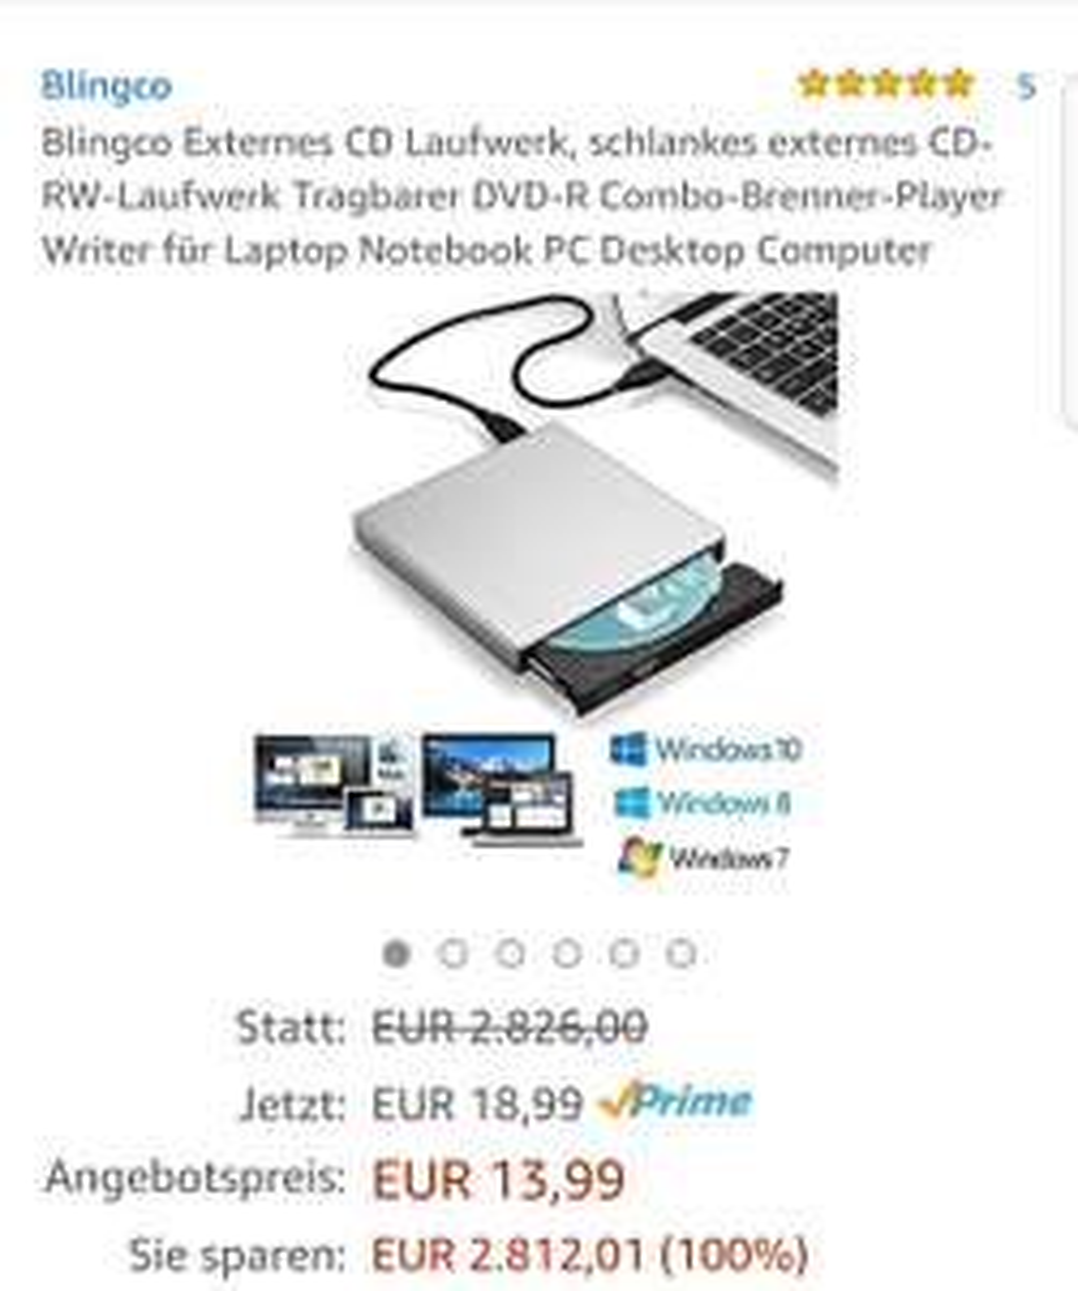 Blingco externes CD Laufwerk 13.99€ statt 2826€ = 2812.01€ 99.50495% Ersparnis